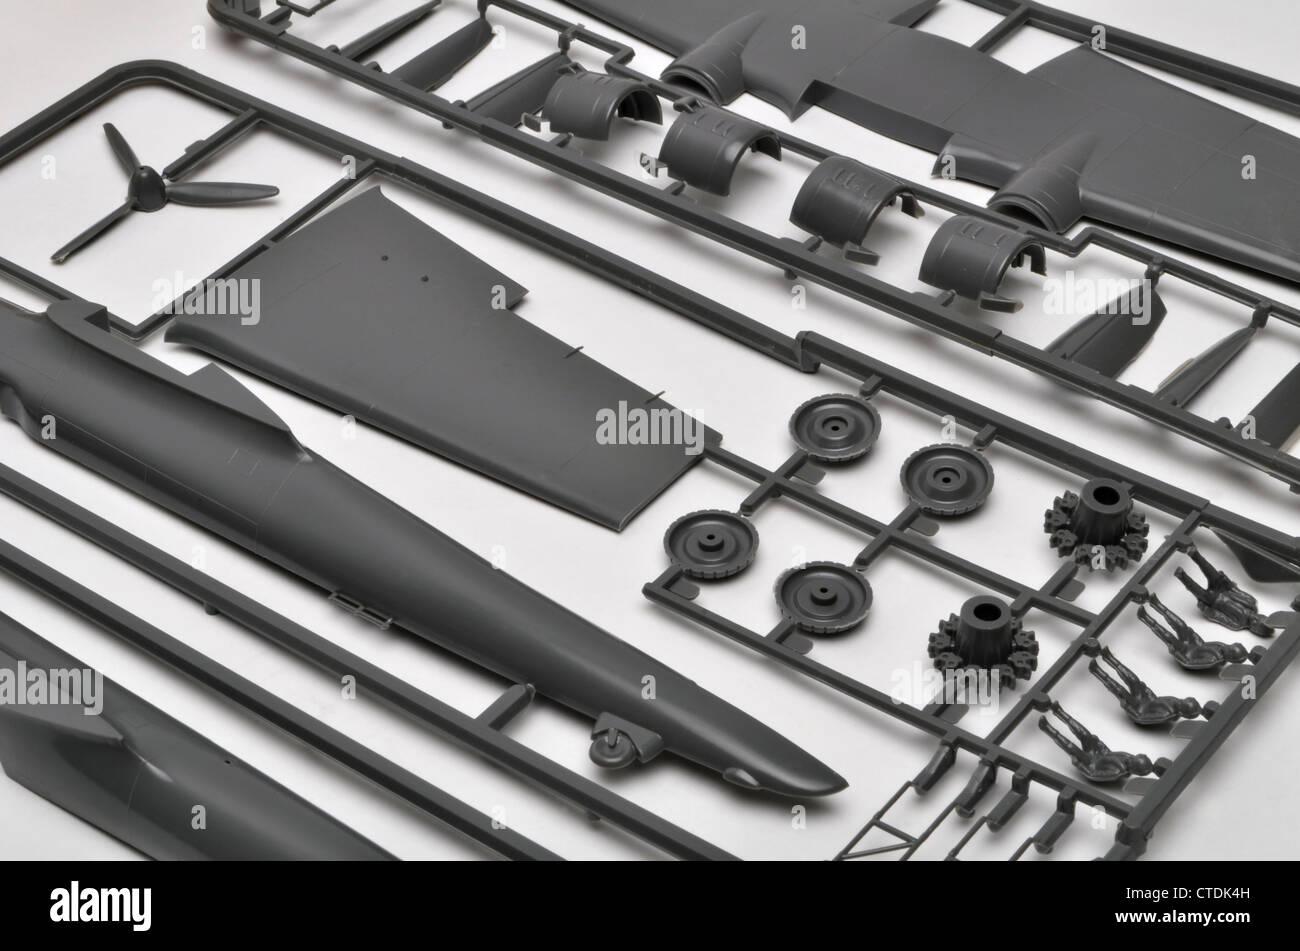 Frosch 1/72 Skala Dornier-17 Polystyrol Plastikmodell Bau Kit Flugzeugteile auf Angüsse. Stockbild